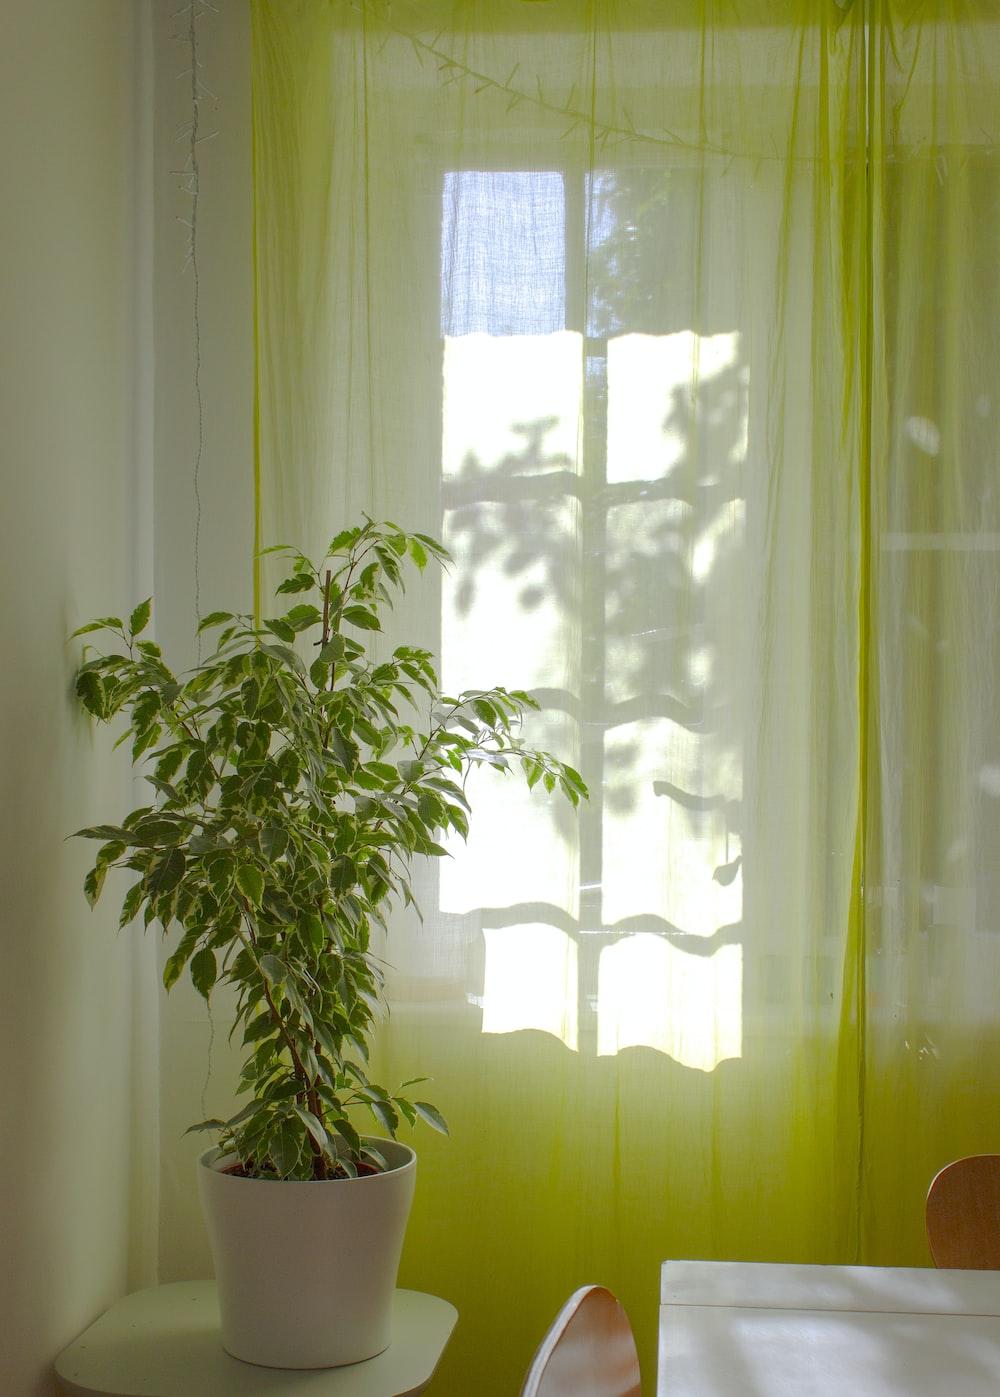 green plant near white window curtain